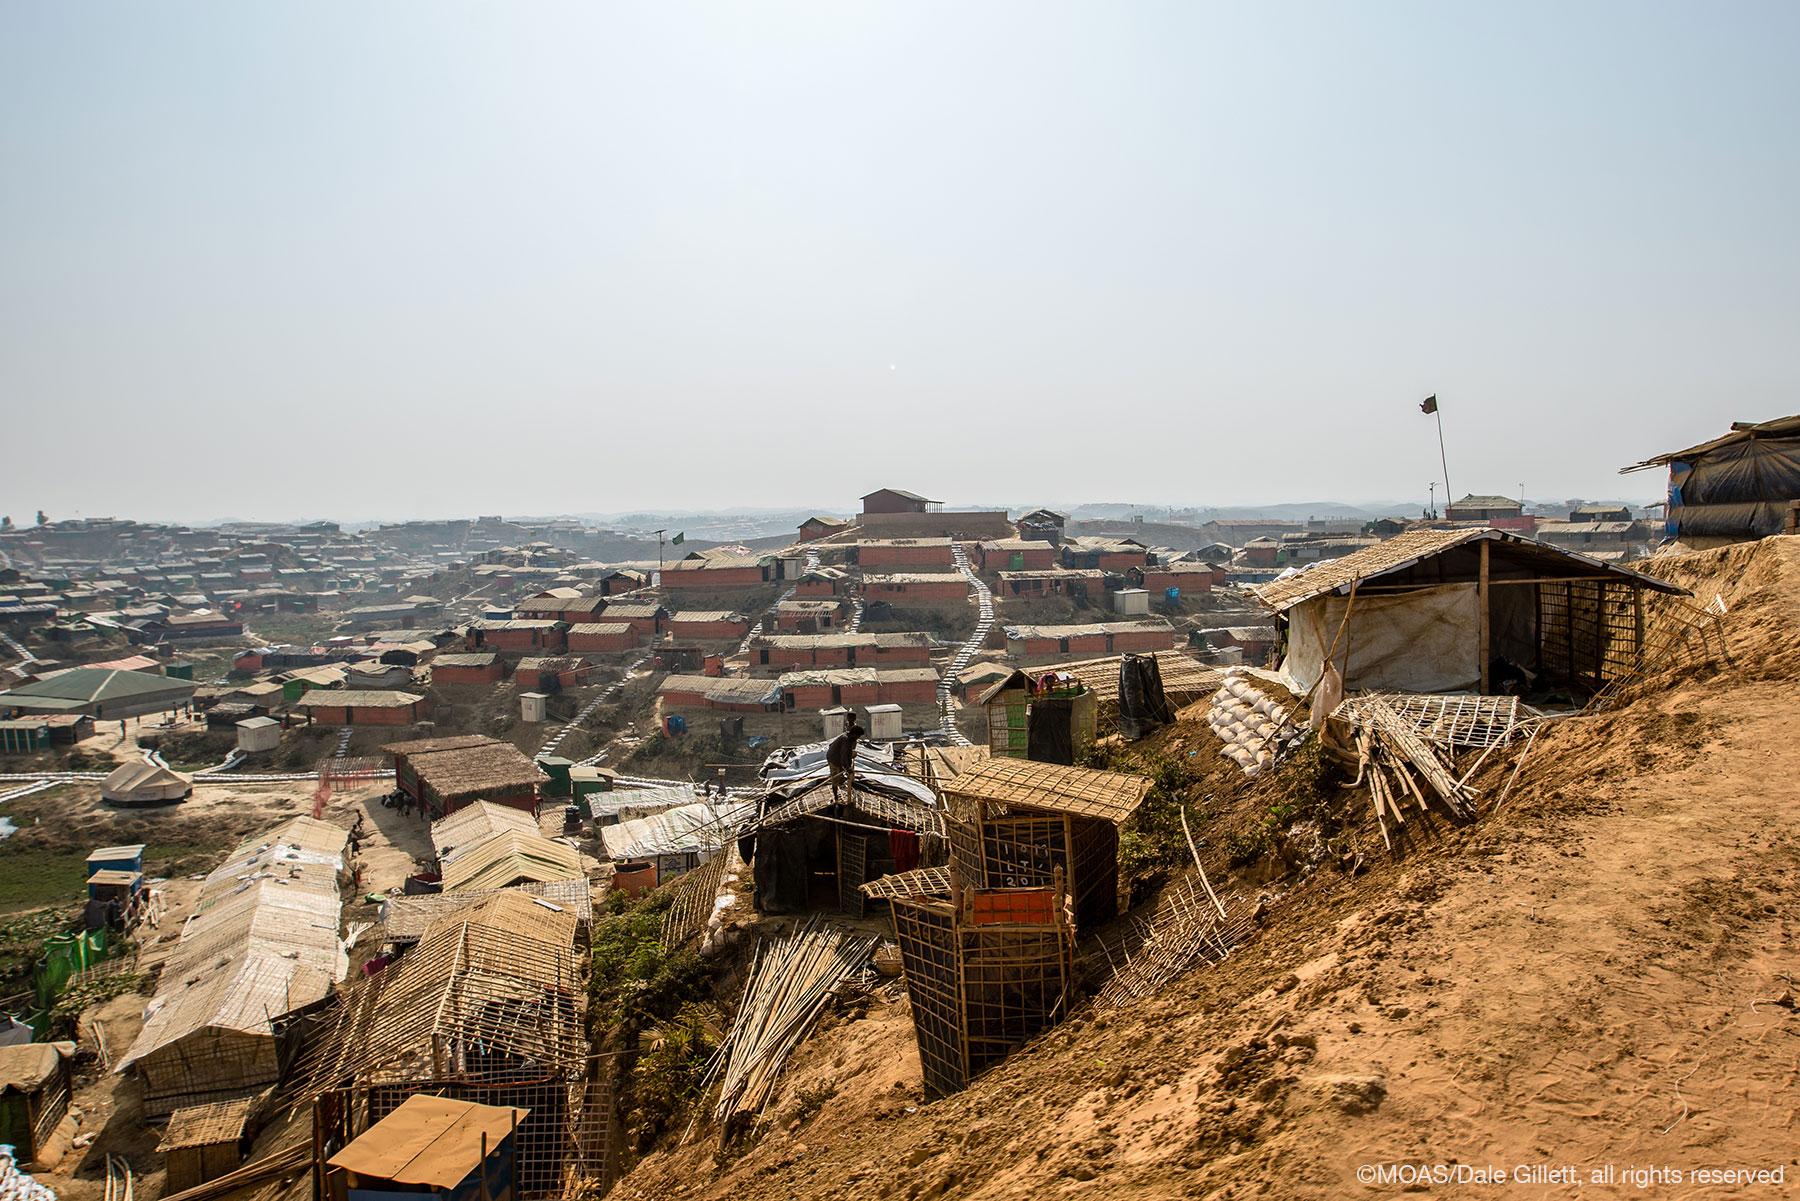 kutupalong-refugee-camp-bangladesh-09152_copyright_MOAS_Dale-Gillett